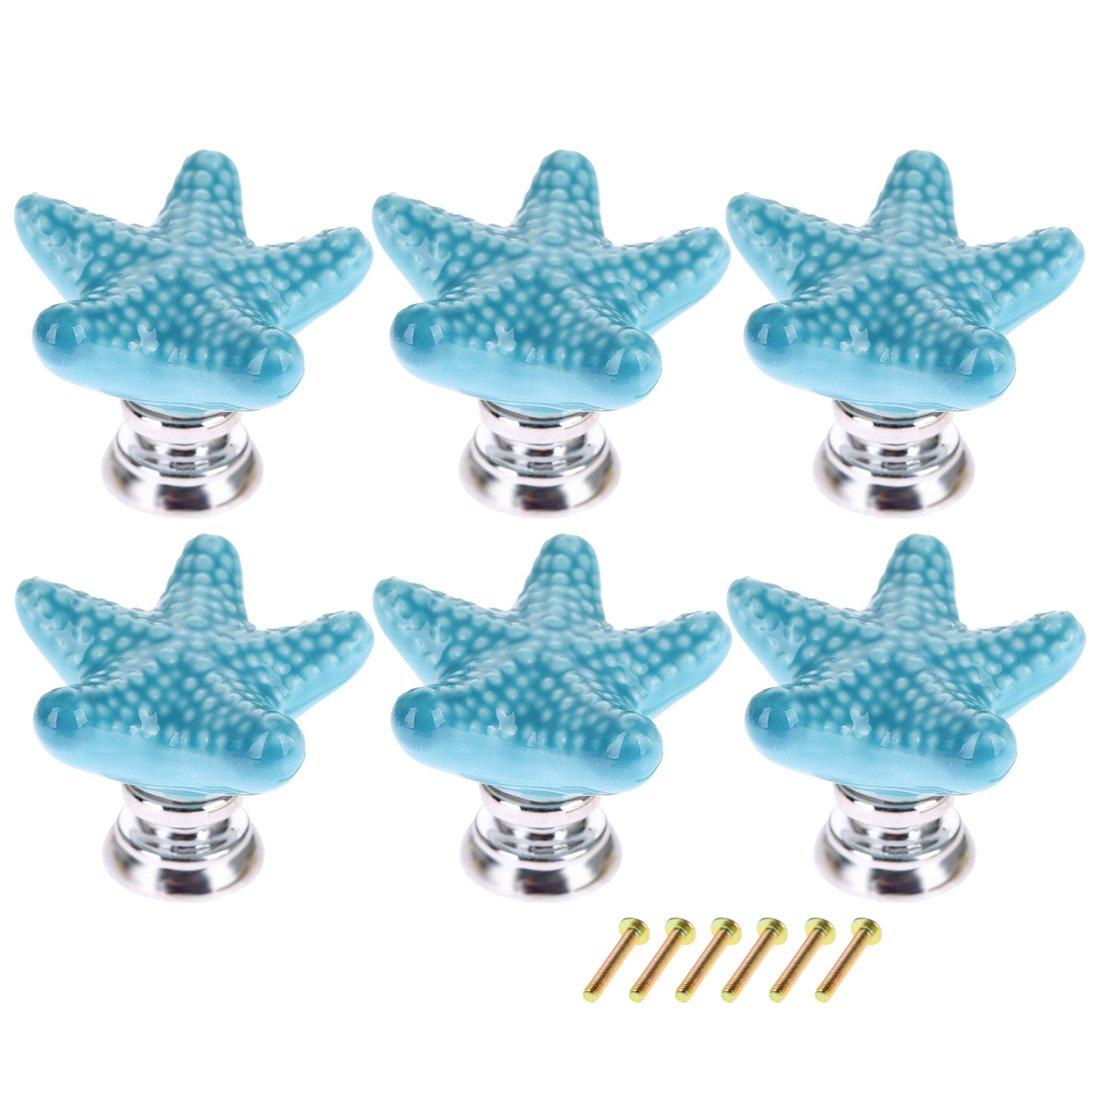 XSHION 6pcs Children's Furniture Drawer Handles Ceramic Starfish Shaped (BLUE)